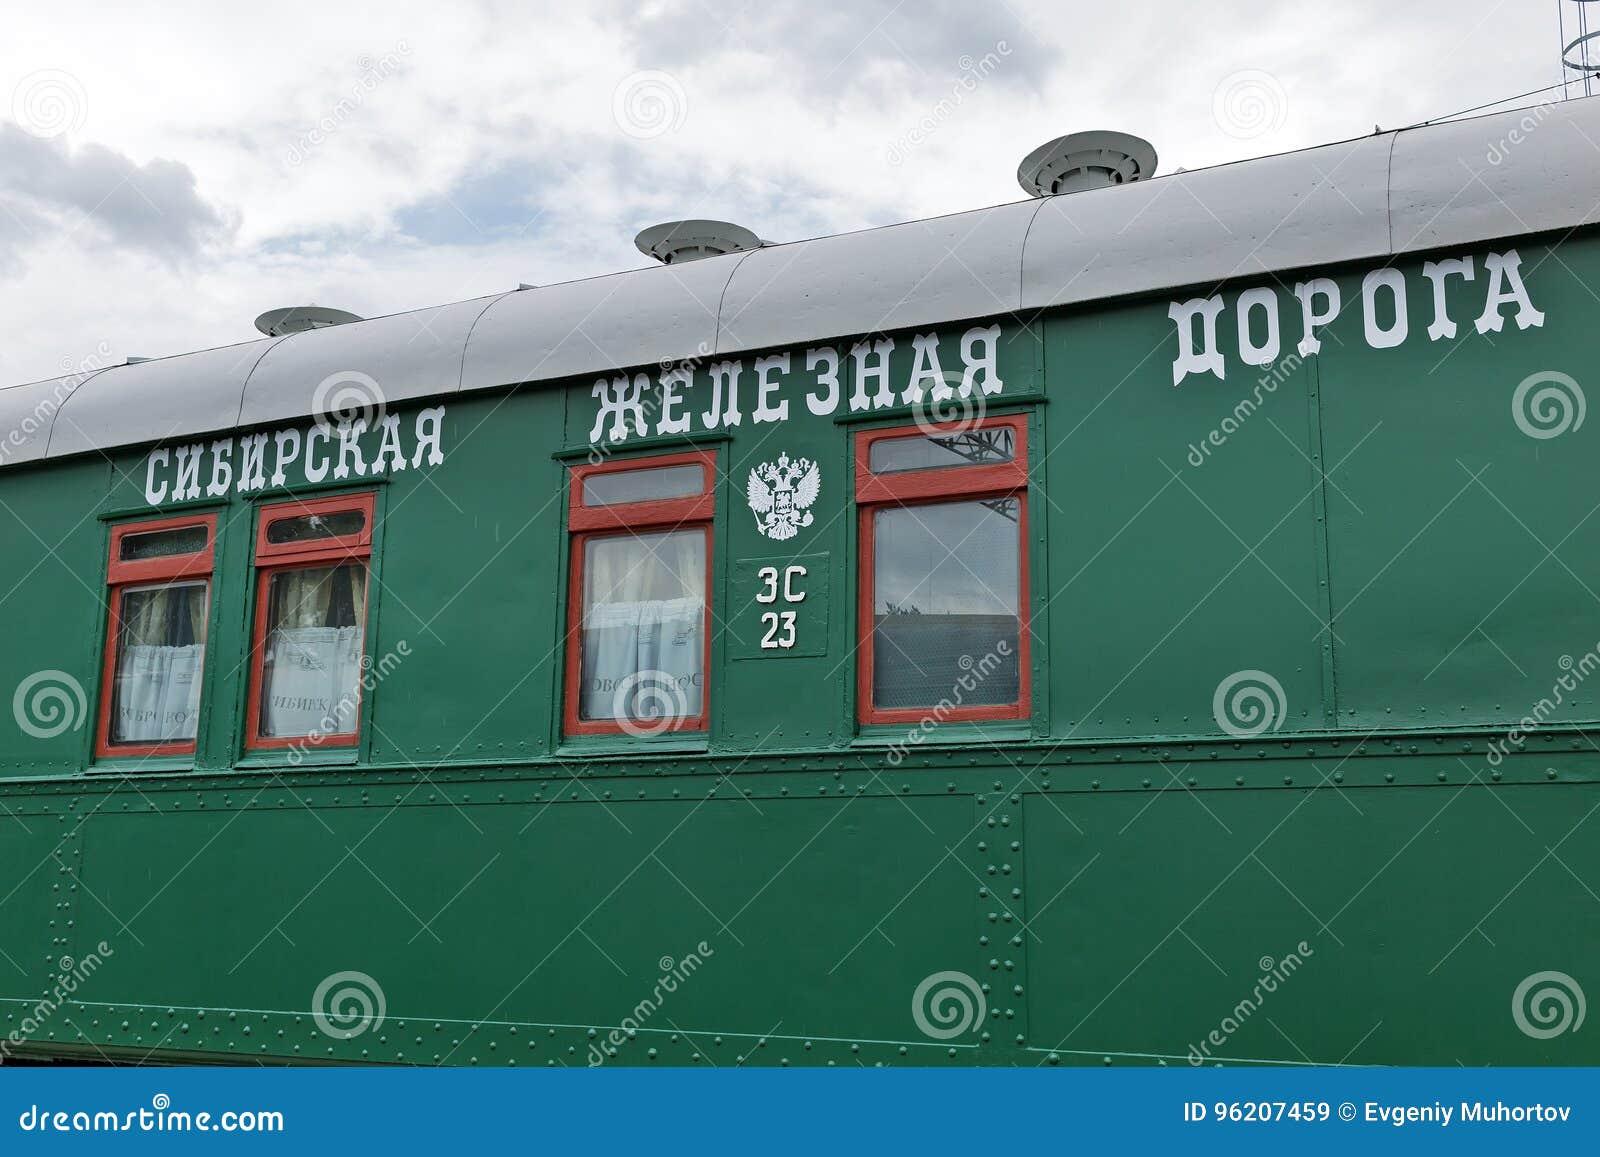 Rail car service armored No. 23, six-axle on ball bearings. Novosibirsk Museum of railway equipment, Siberia, Russia